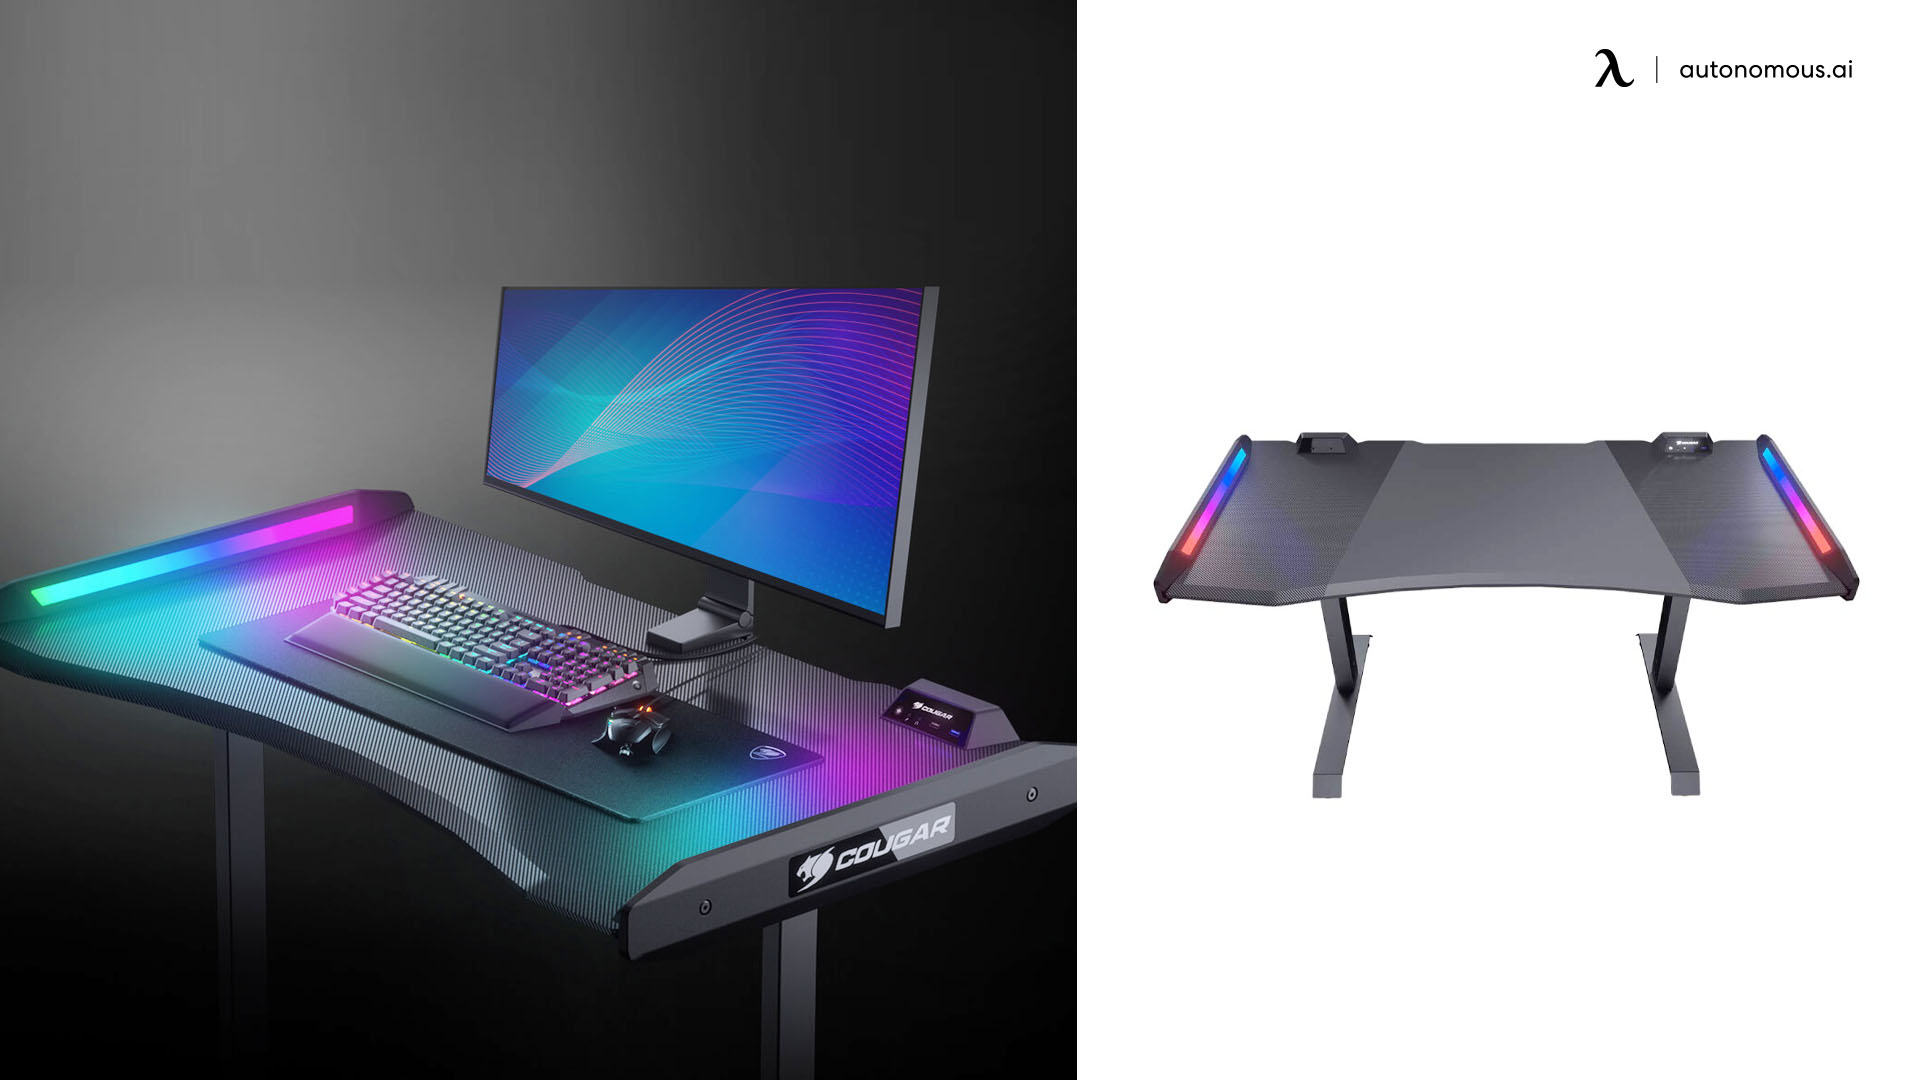 Cougar Mars Gaming Desk